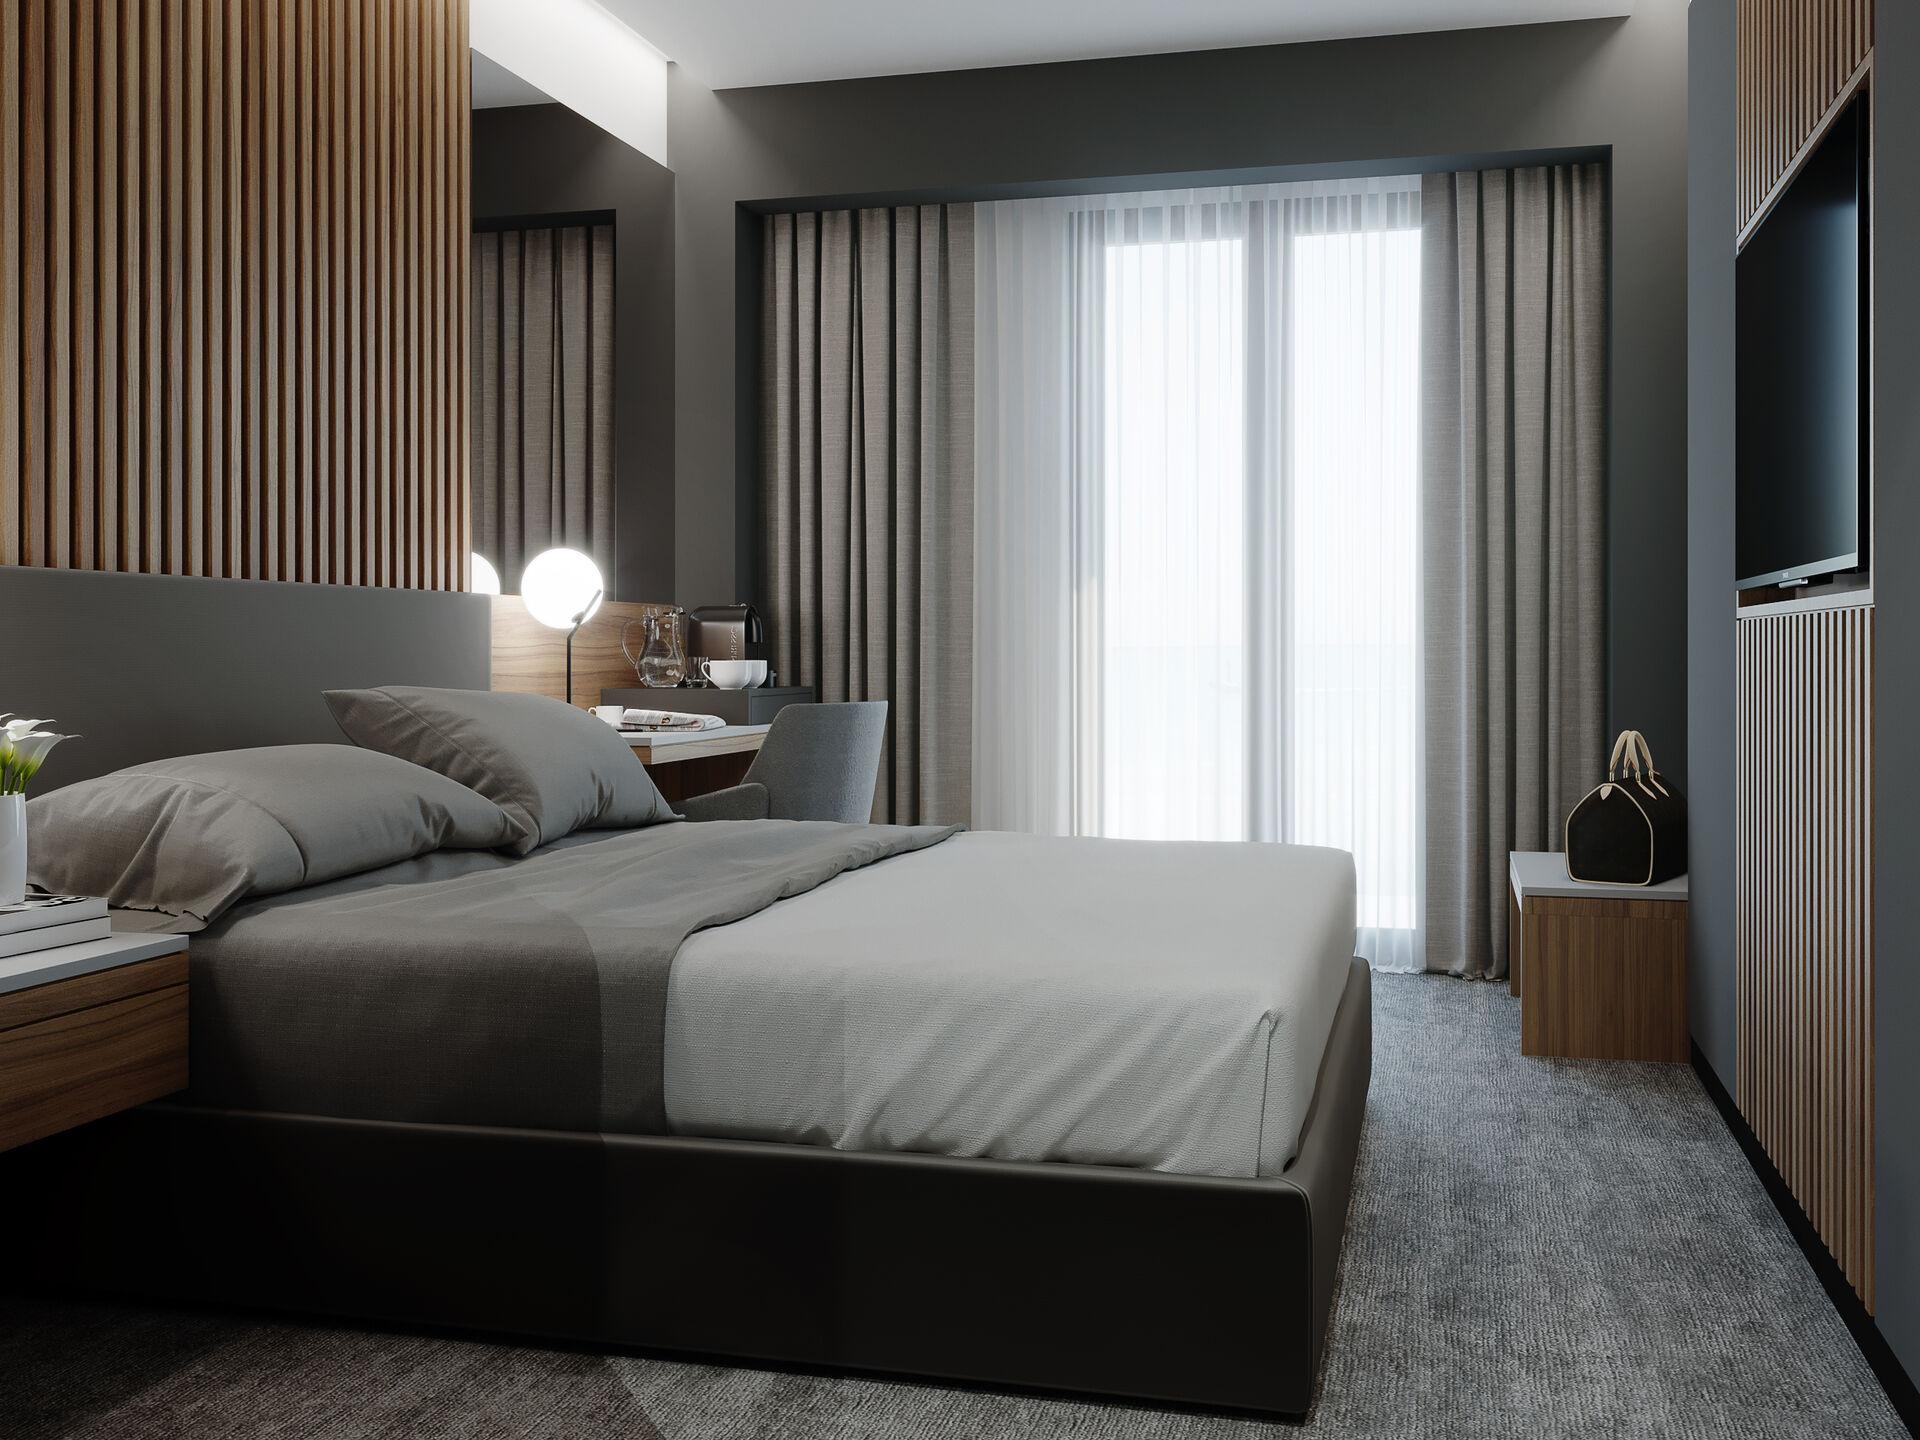 https://cms.satur.sk/data/imgs/tour_image/orig/bedroom_hotel-noemia-3-1949944.jpg